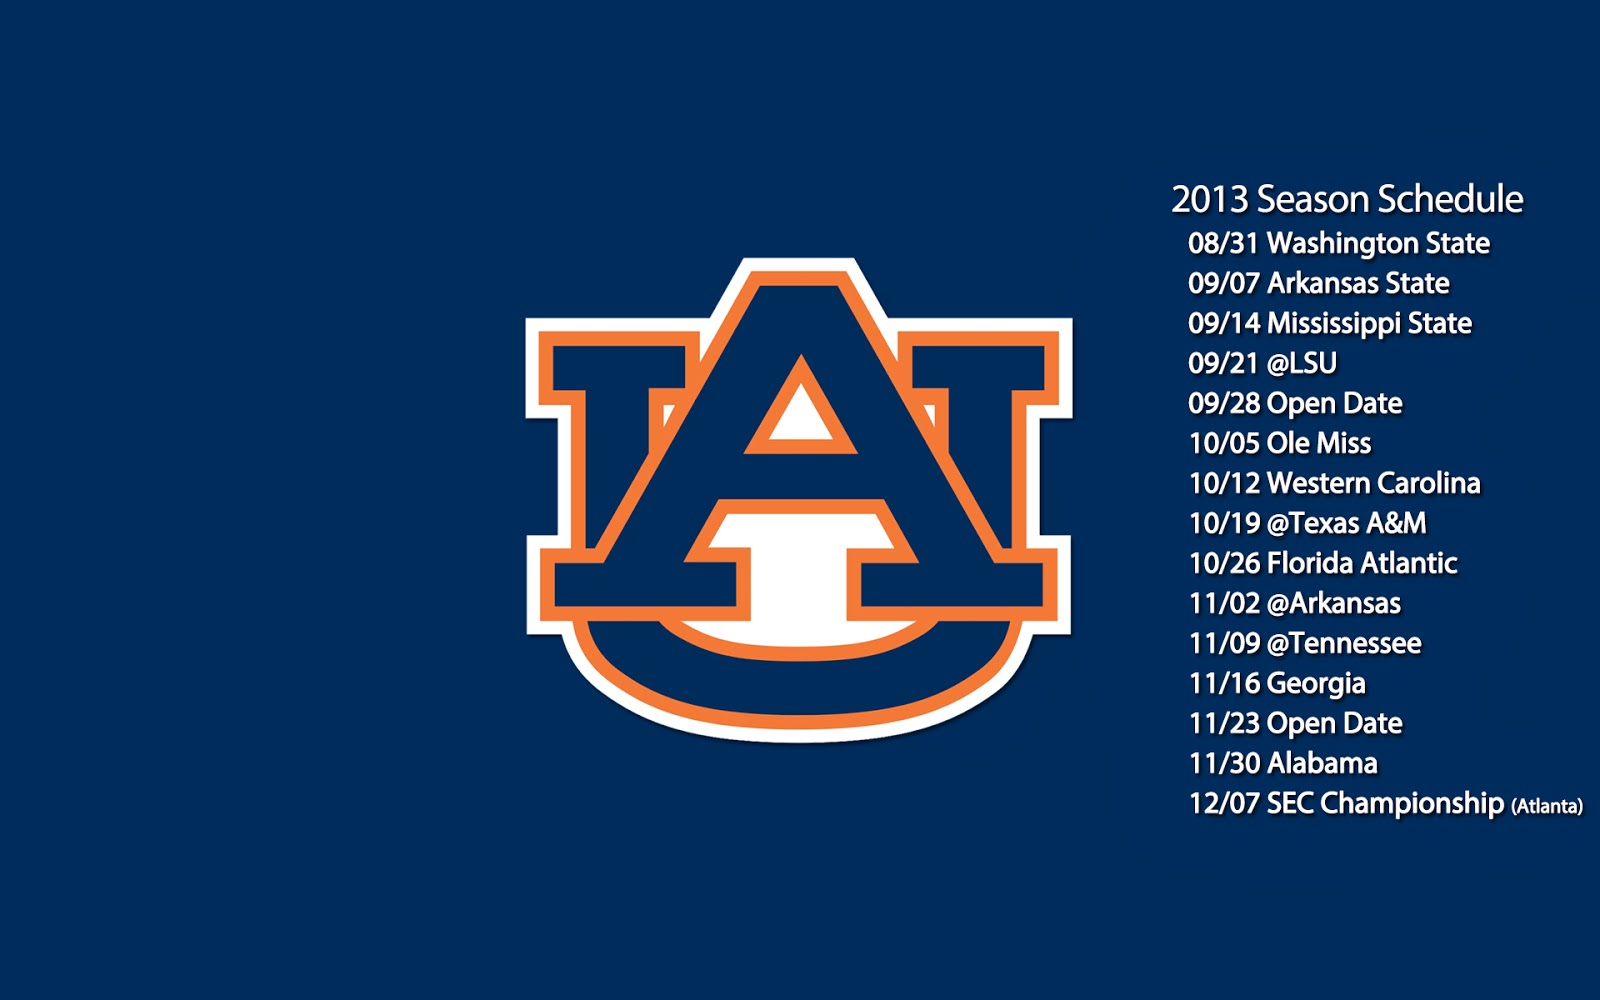 Auburn football wallpaper   beautiful desktop wallpapers 2014 1600x1000